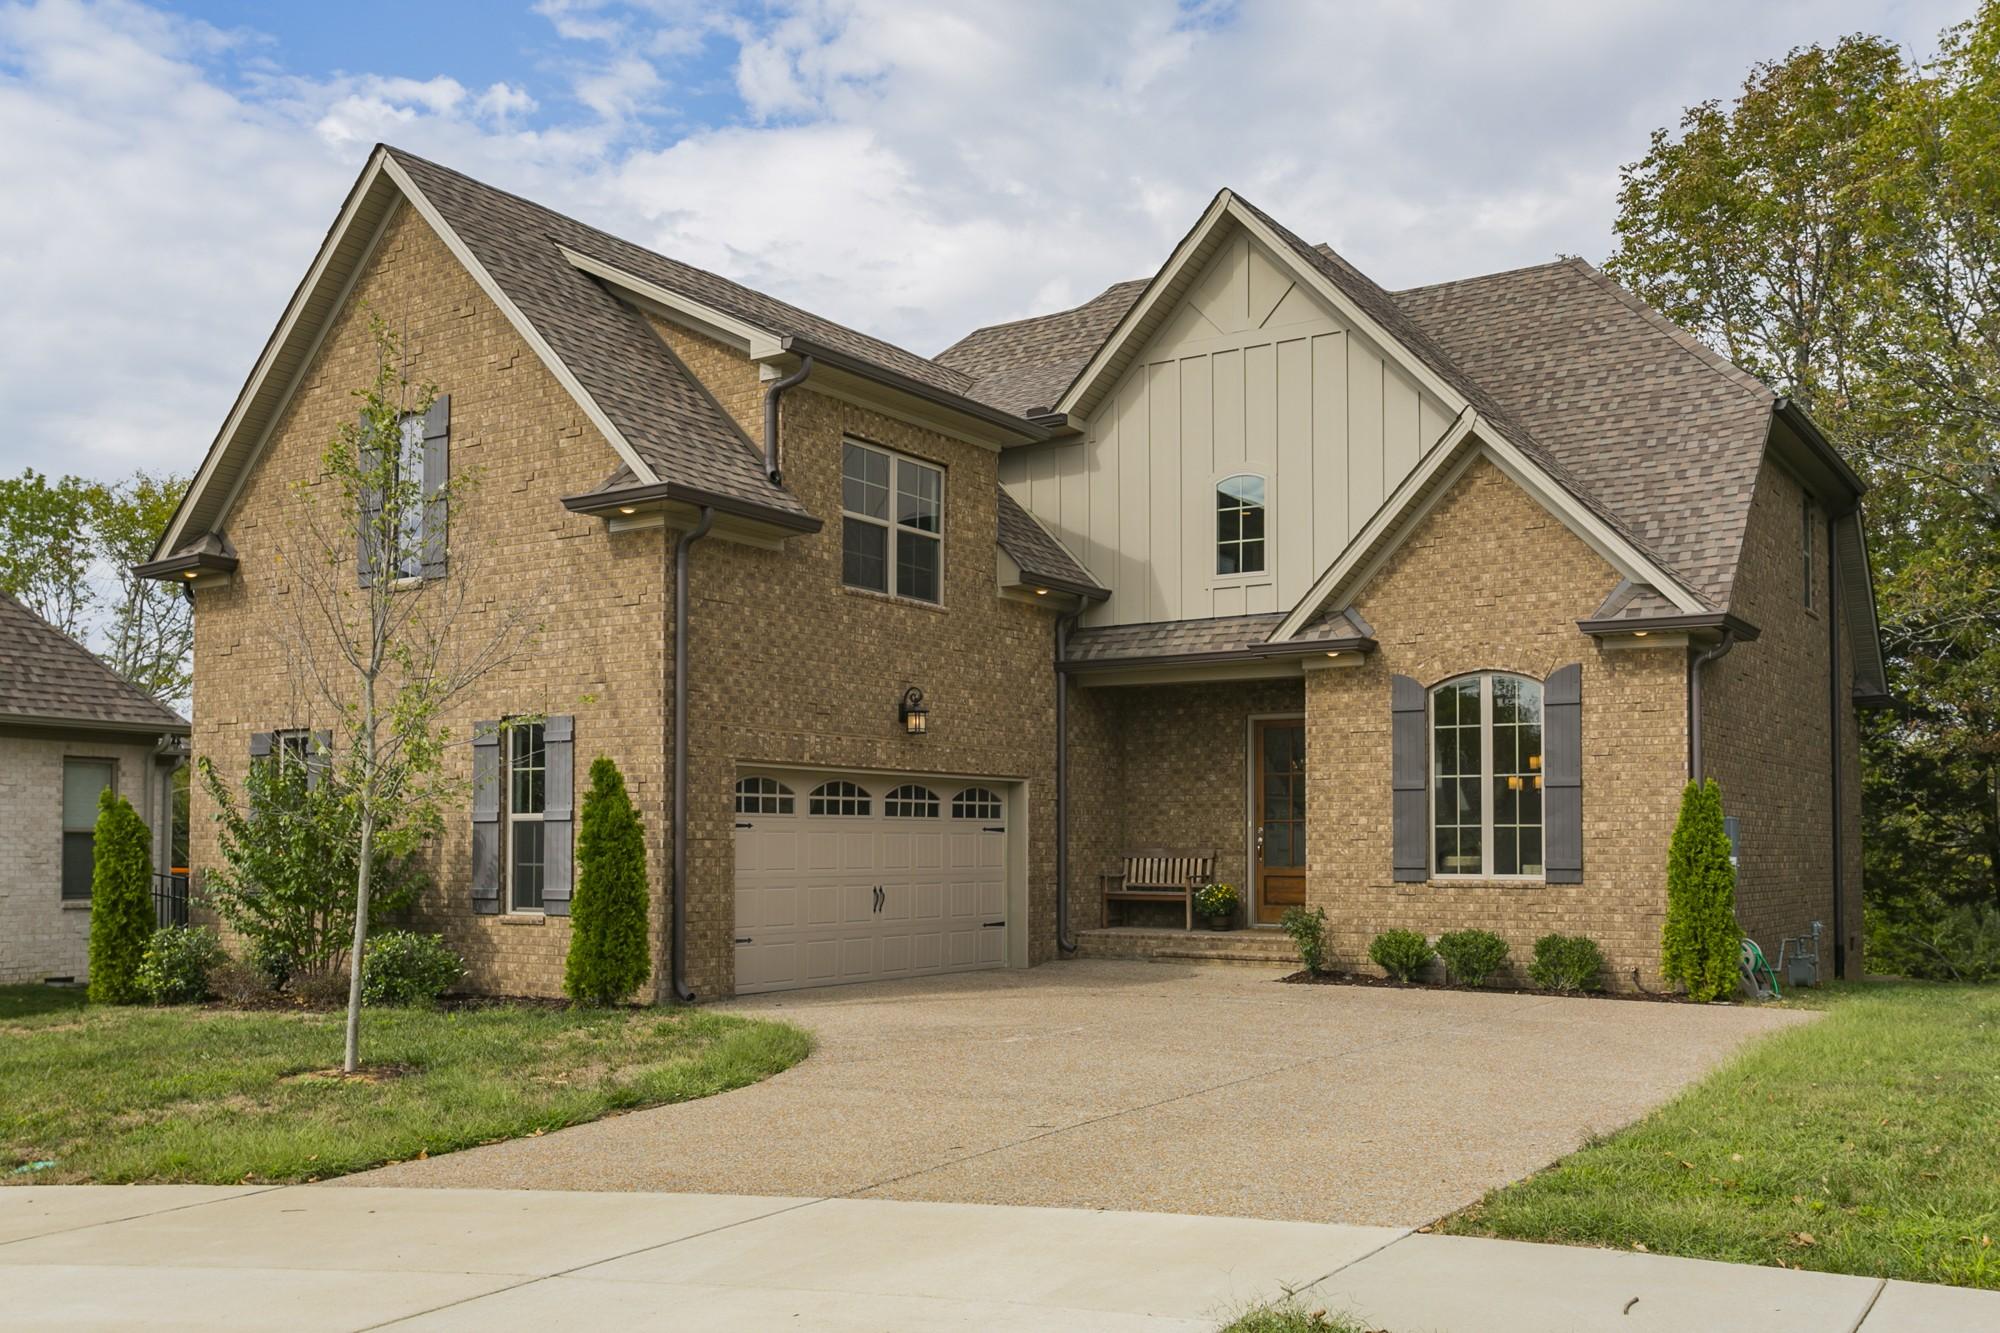 327 Archer Way East, Hendersonville, TN 37075 - Hendersonville, TN real estate listing